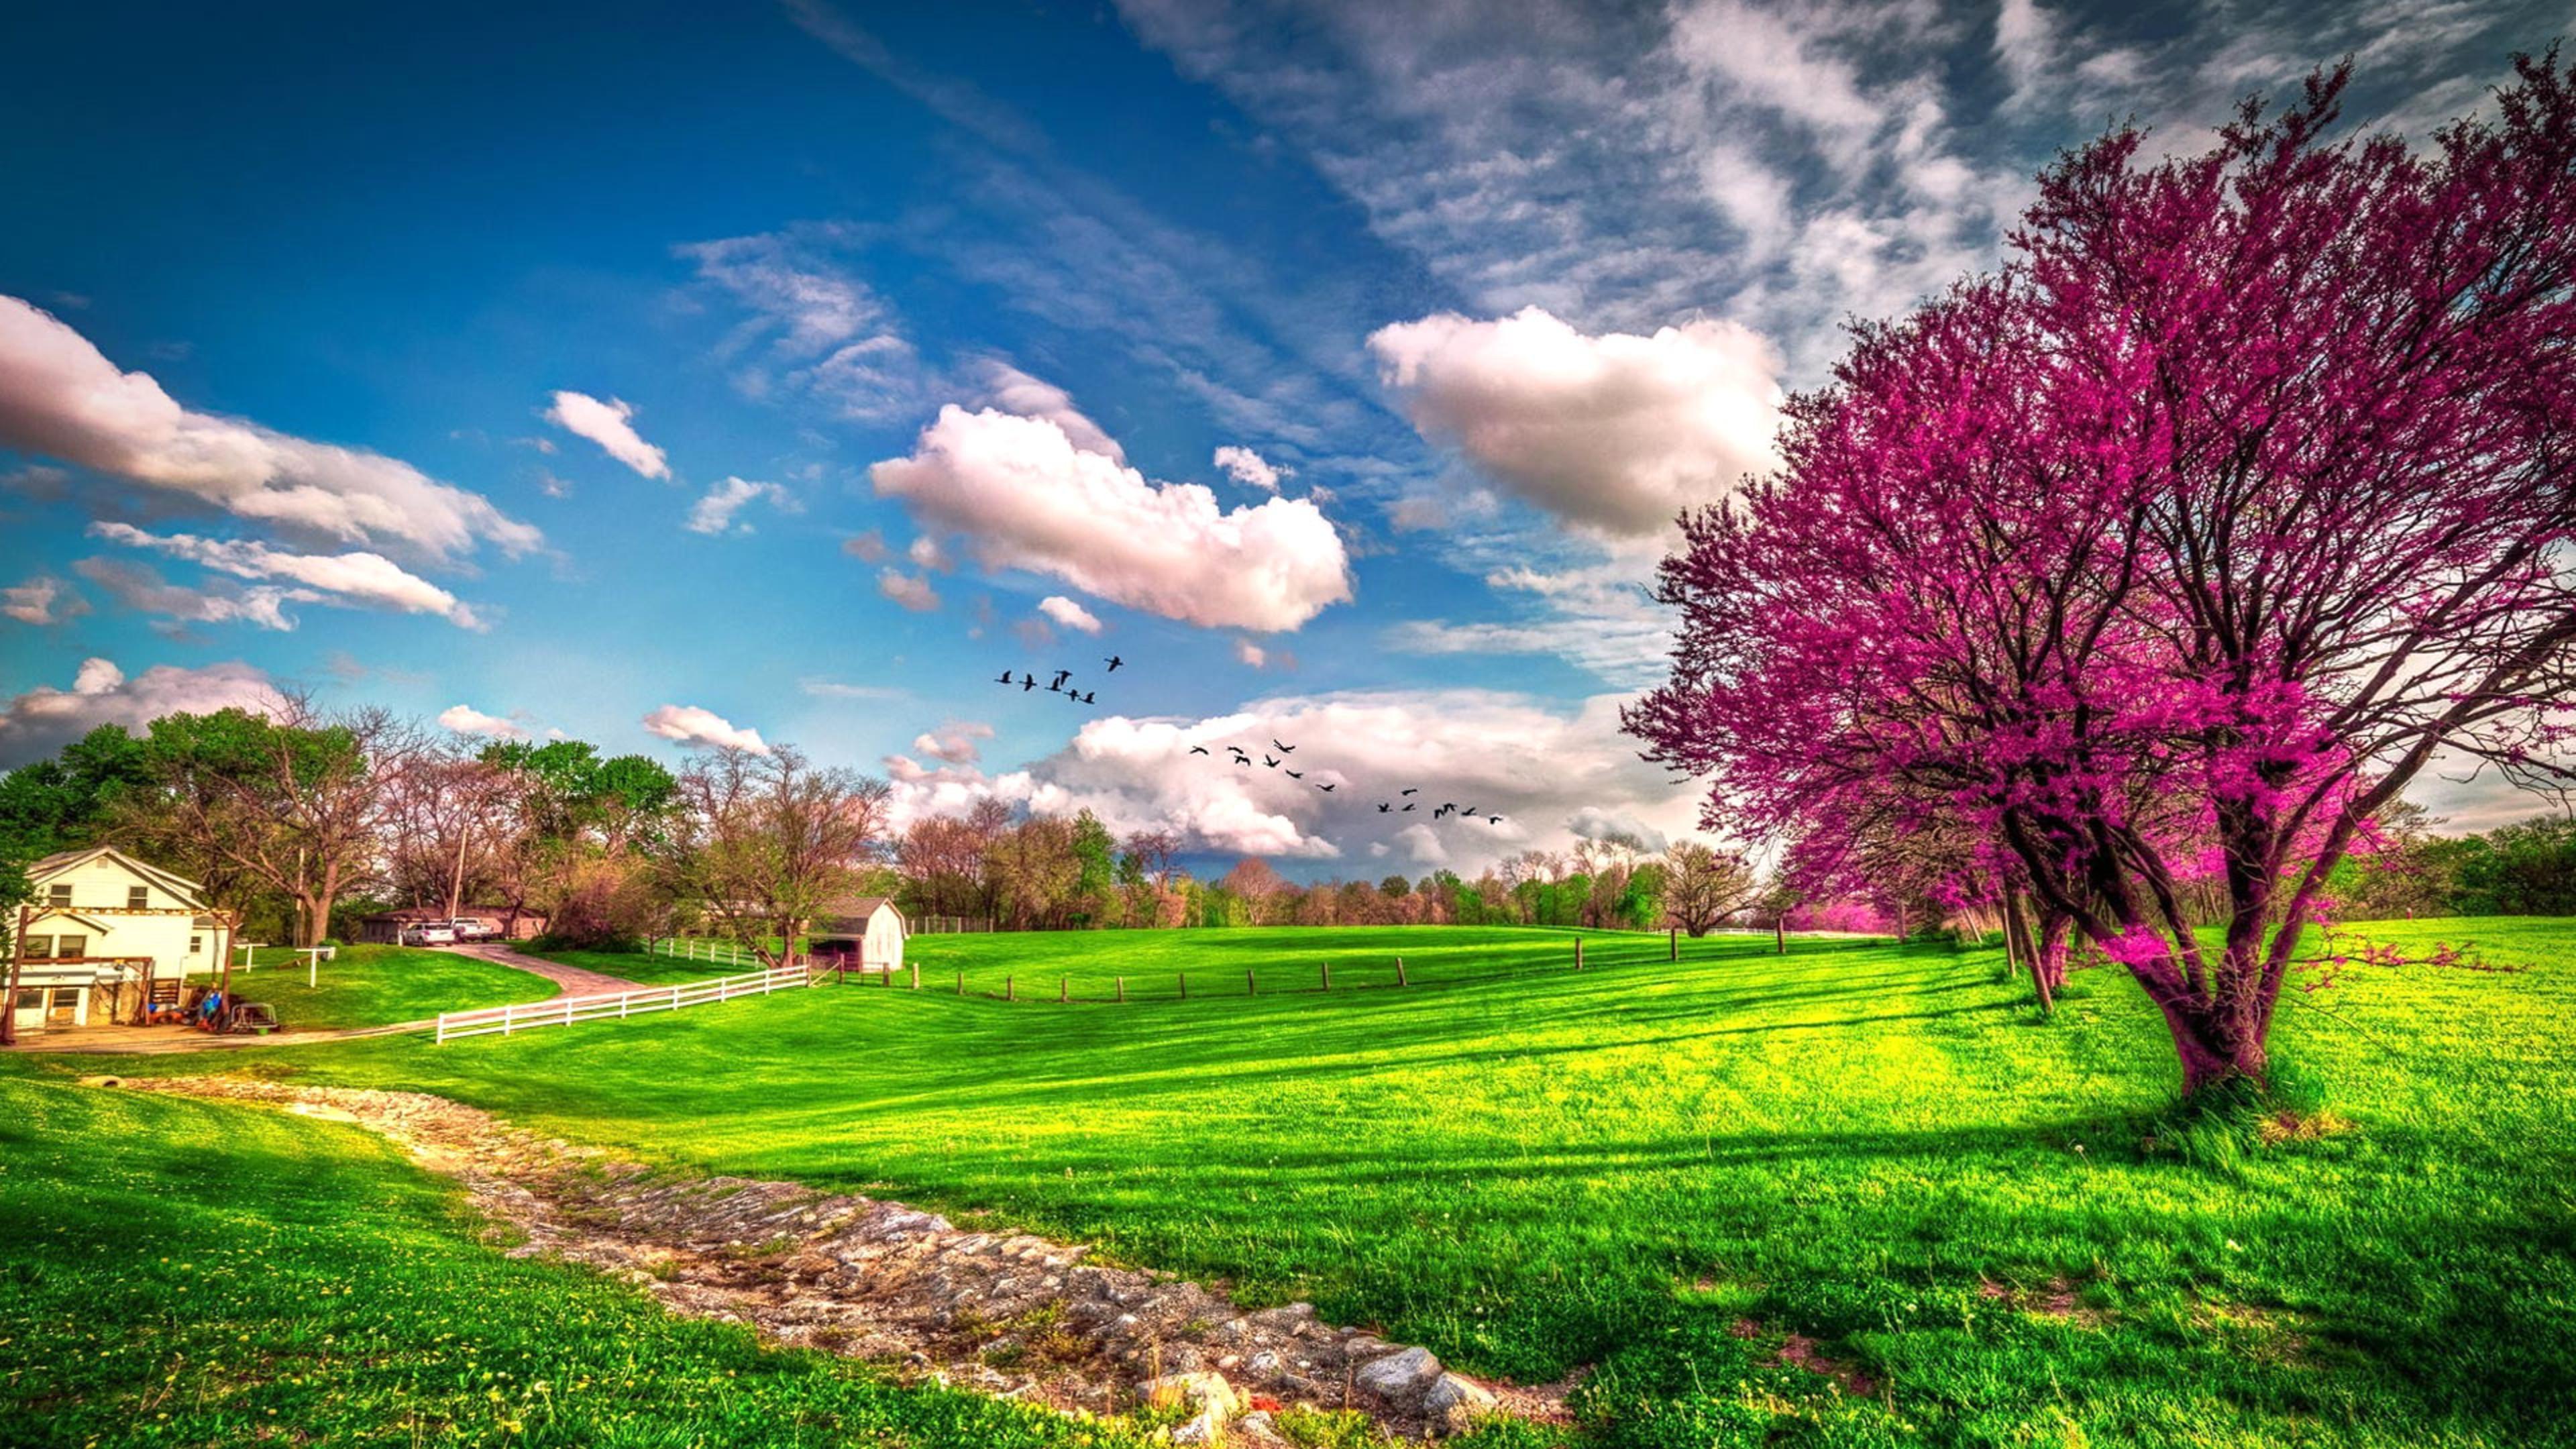 Landscape beautiful spring nature   HD wallpaper Wallpaper 3840x2160